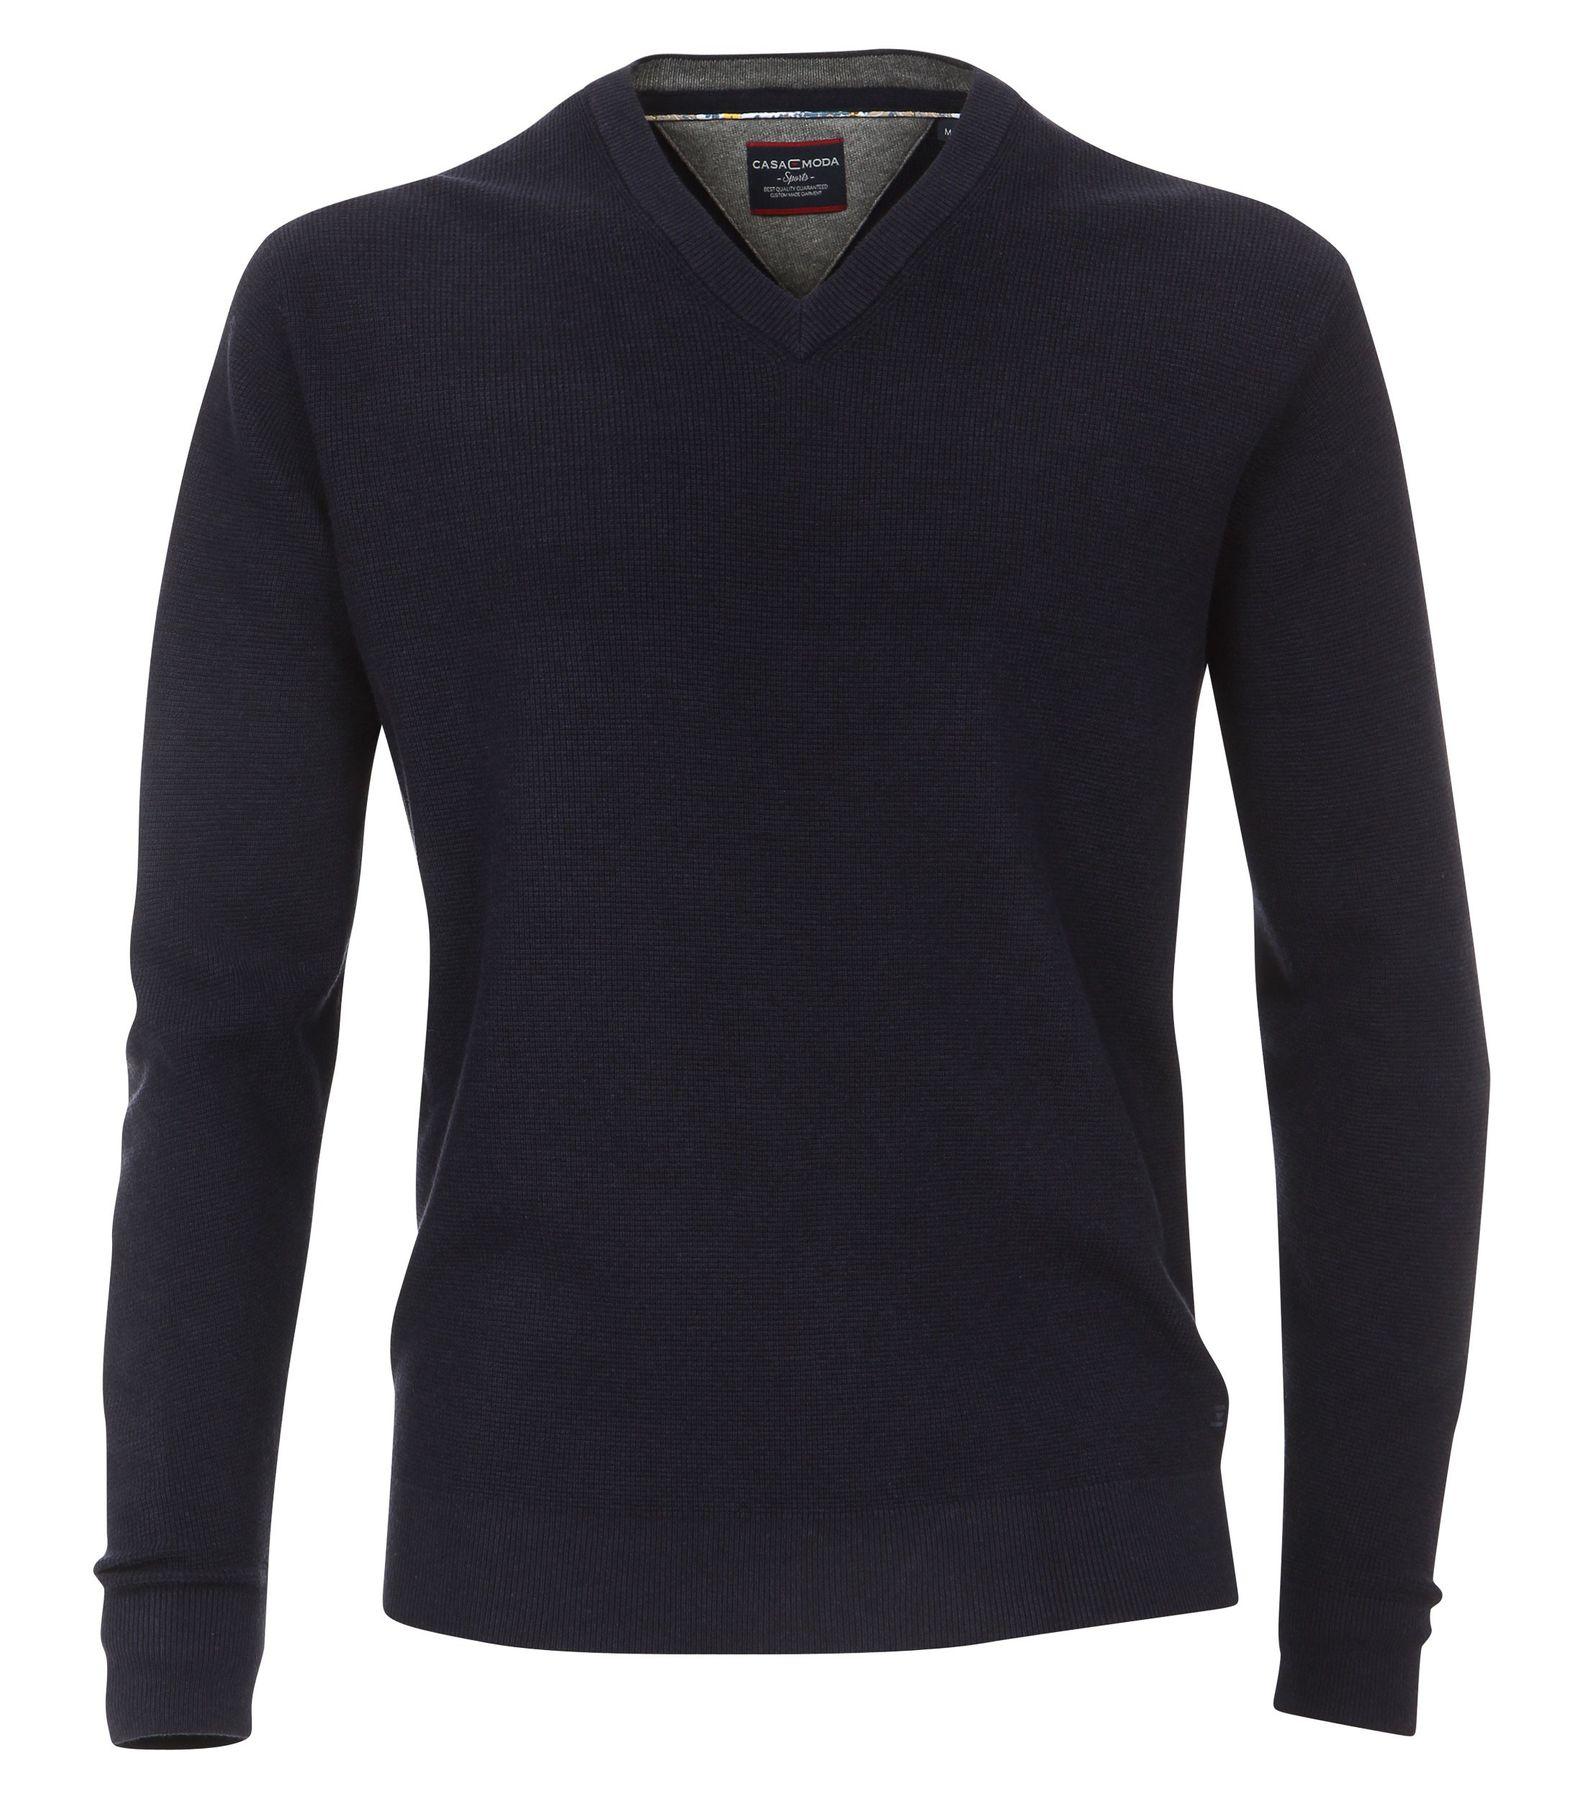 Casa Moda - Unifarbener Herren Pullover mit V-Ausschnitt  (472625000) – Bild 1